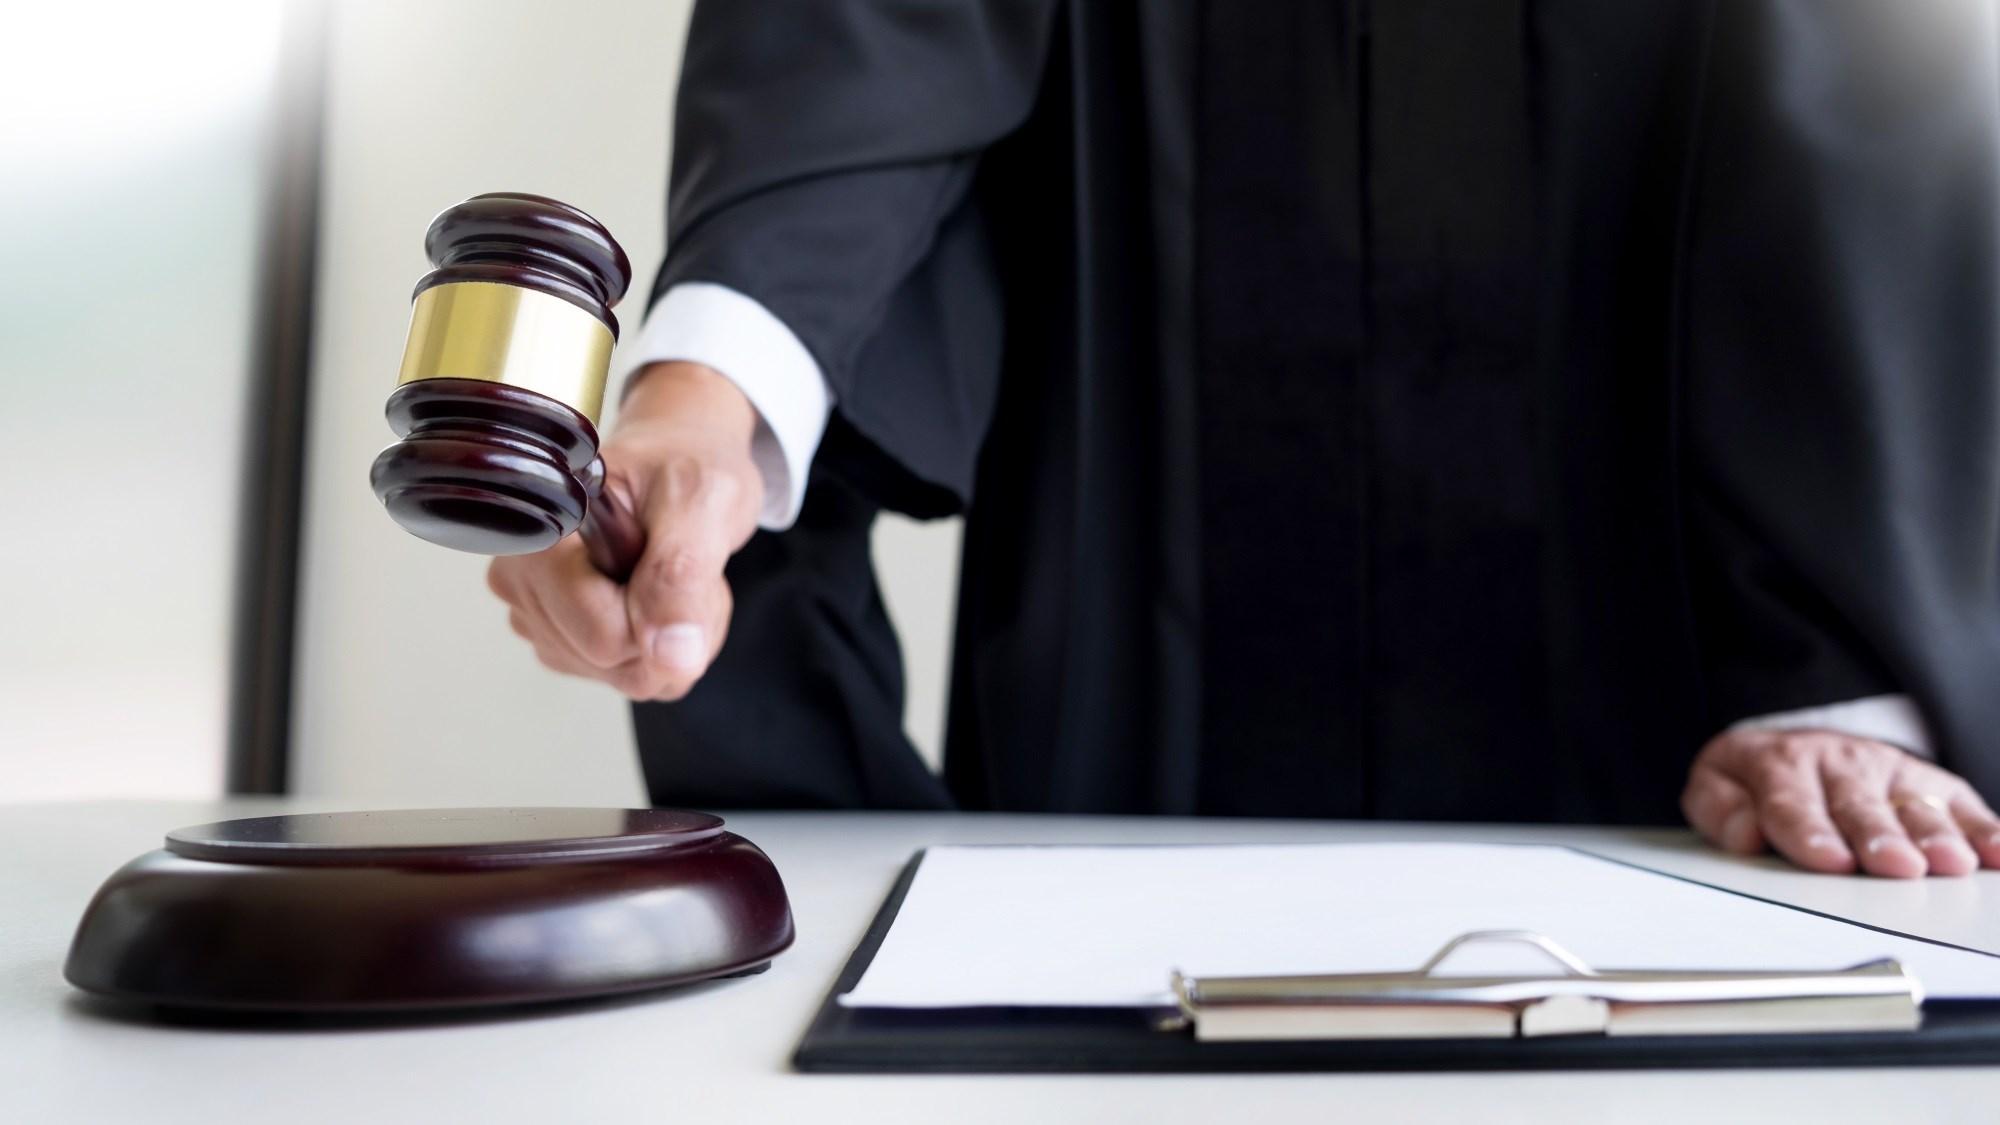 Descriptive, Predictive Data at Odds in Medical Malpractice Courtroom